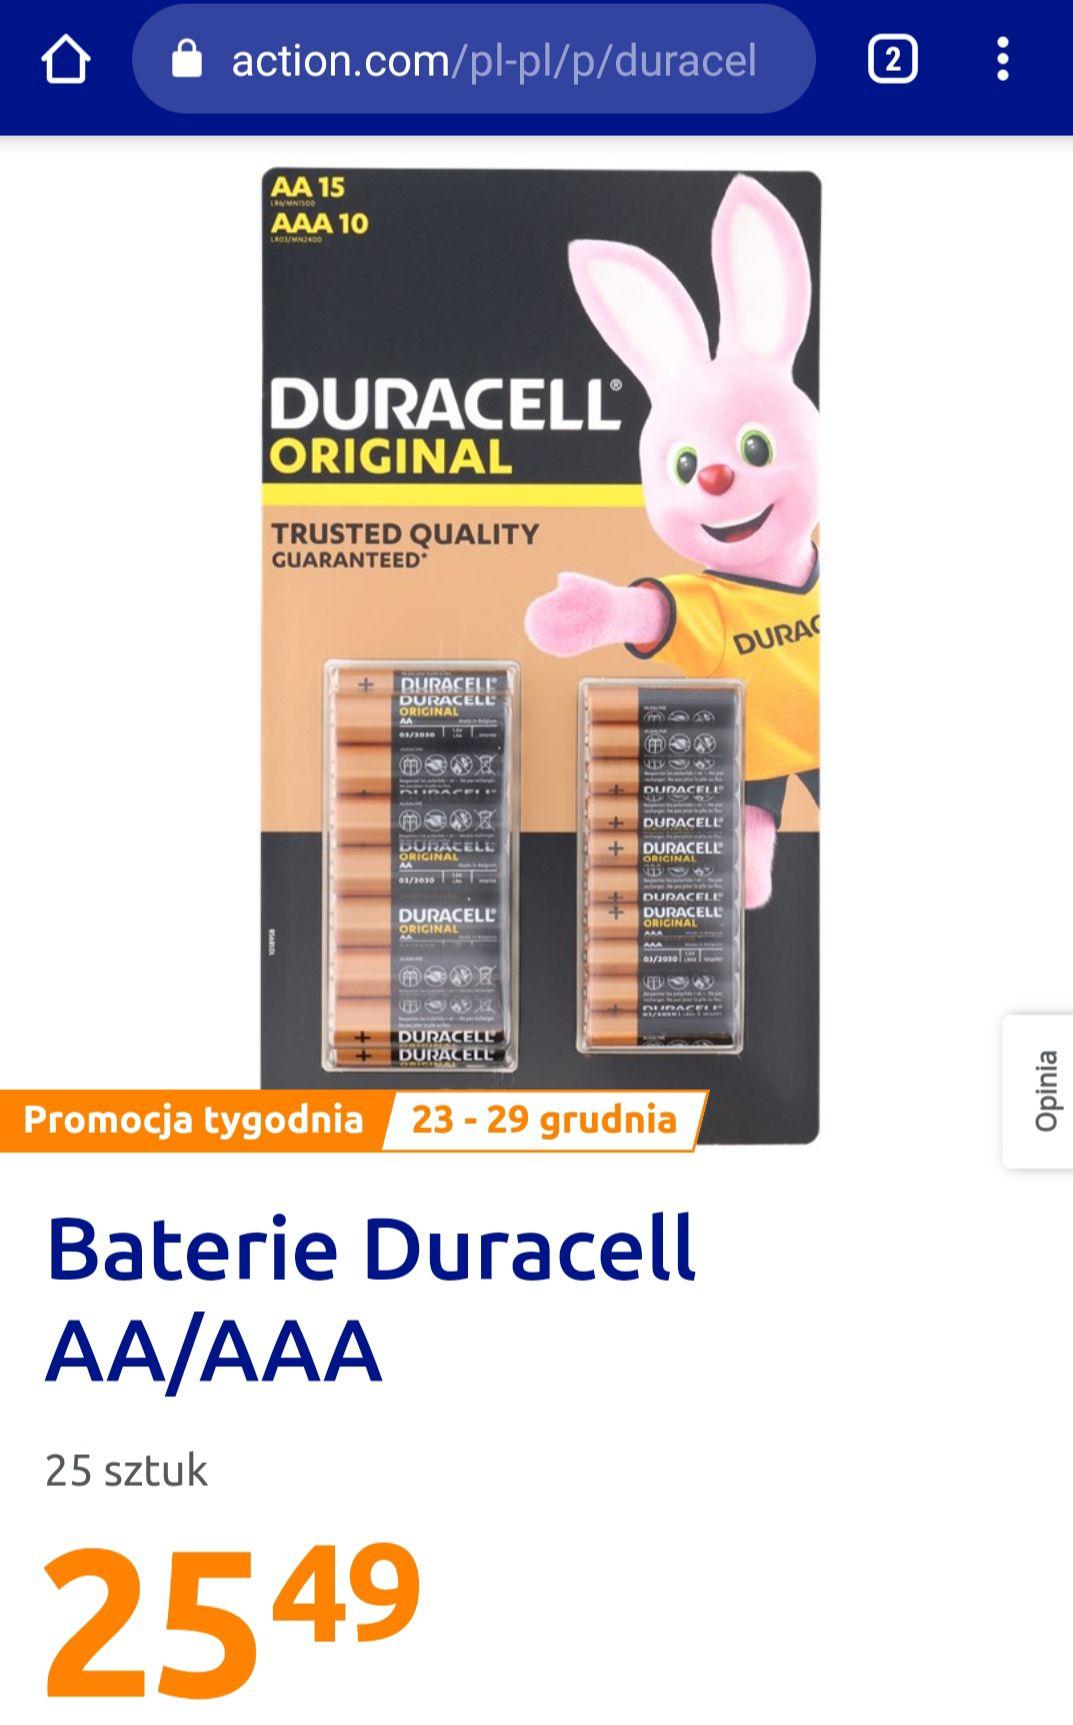 Baterie Duracell 25 sztuk po 25.49. Sklep Action